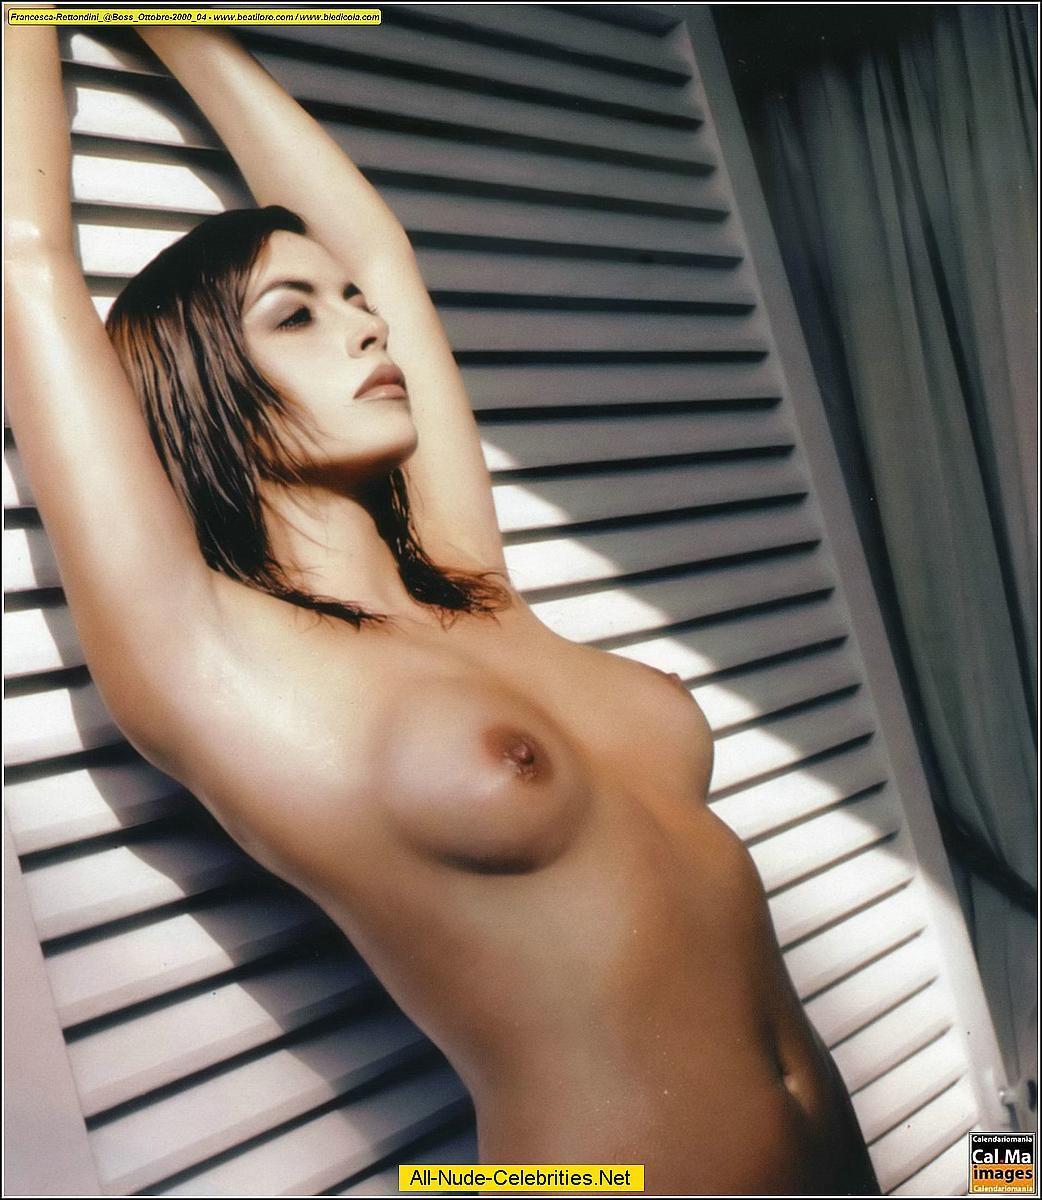 Seems me, nude italy beauty